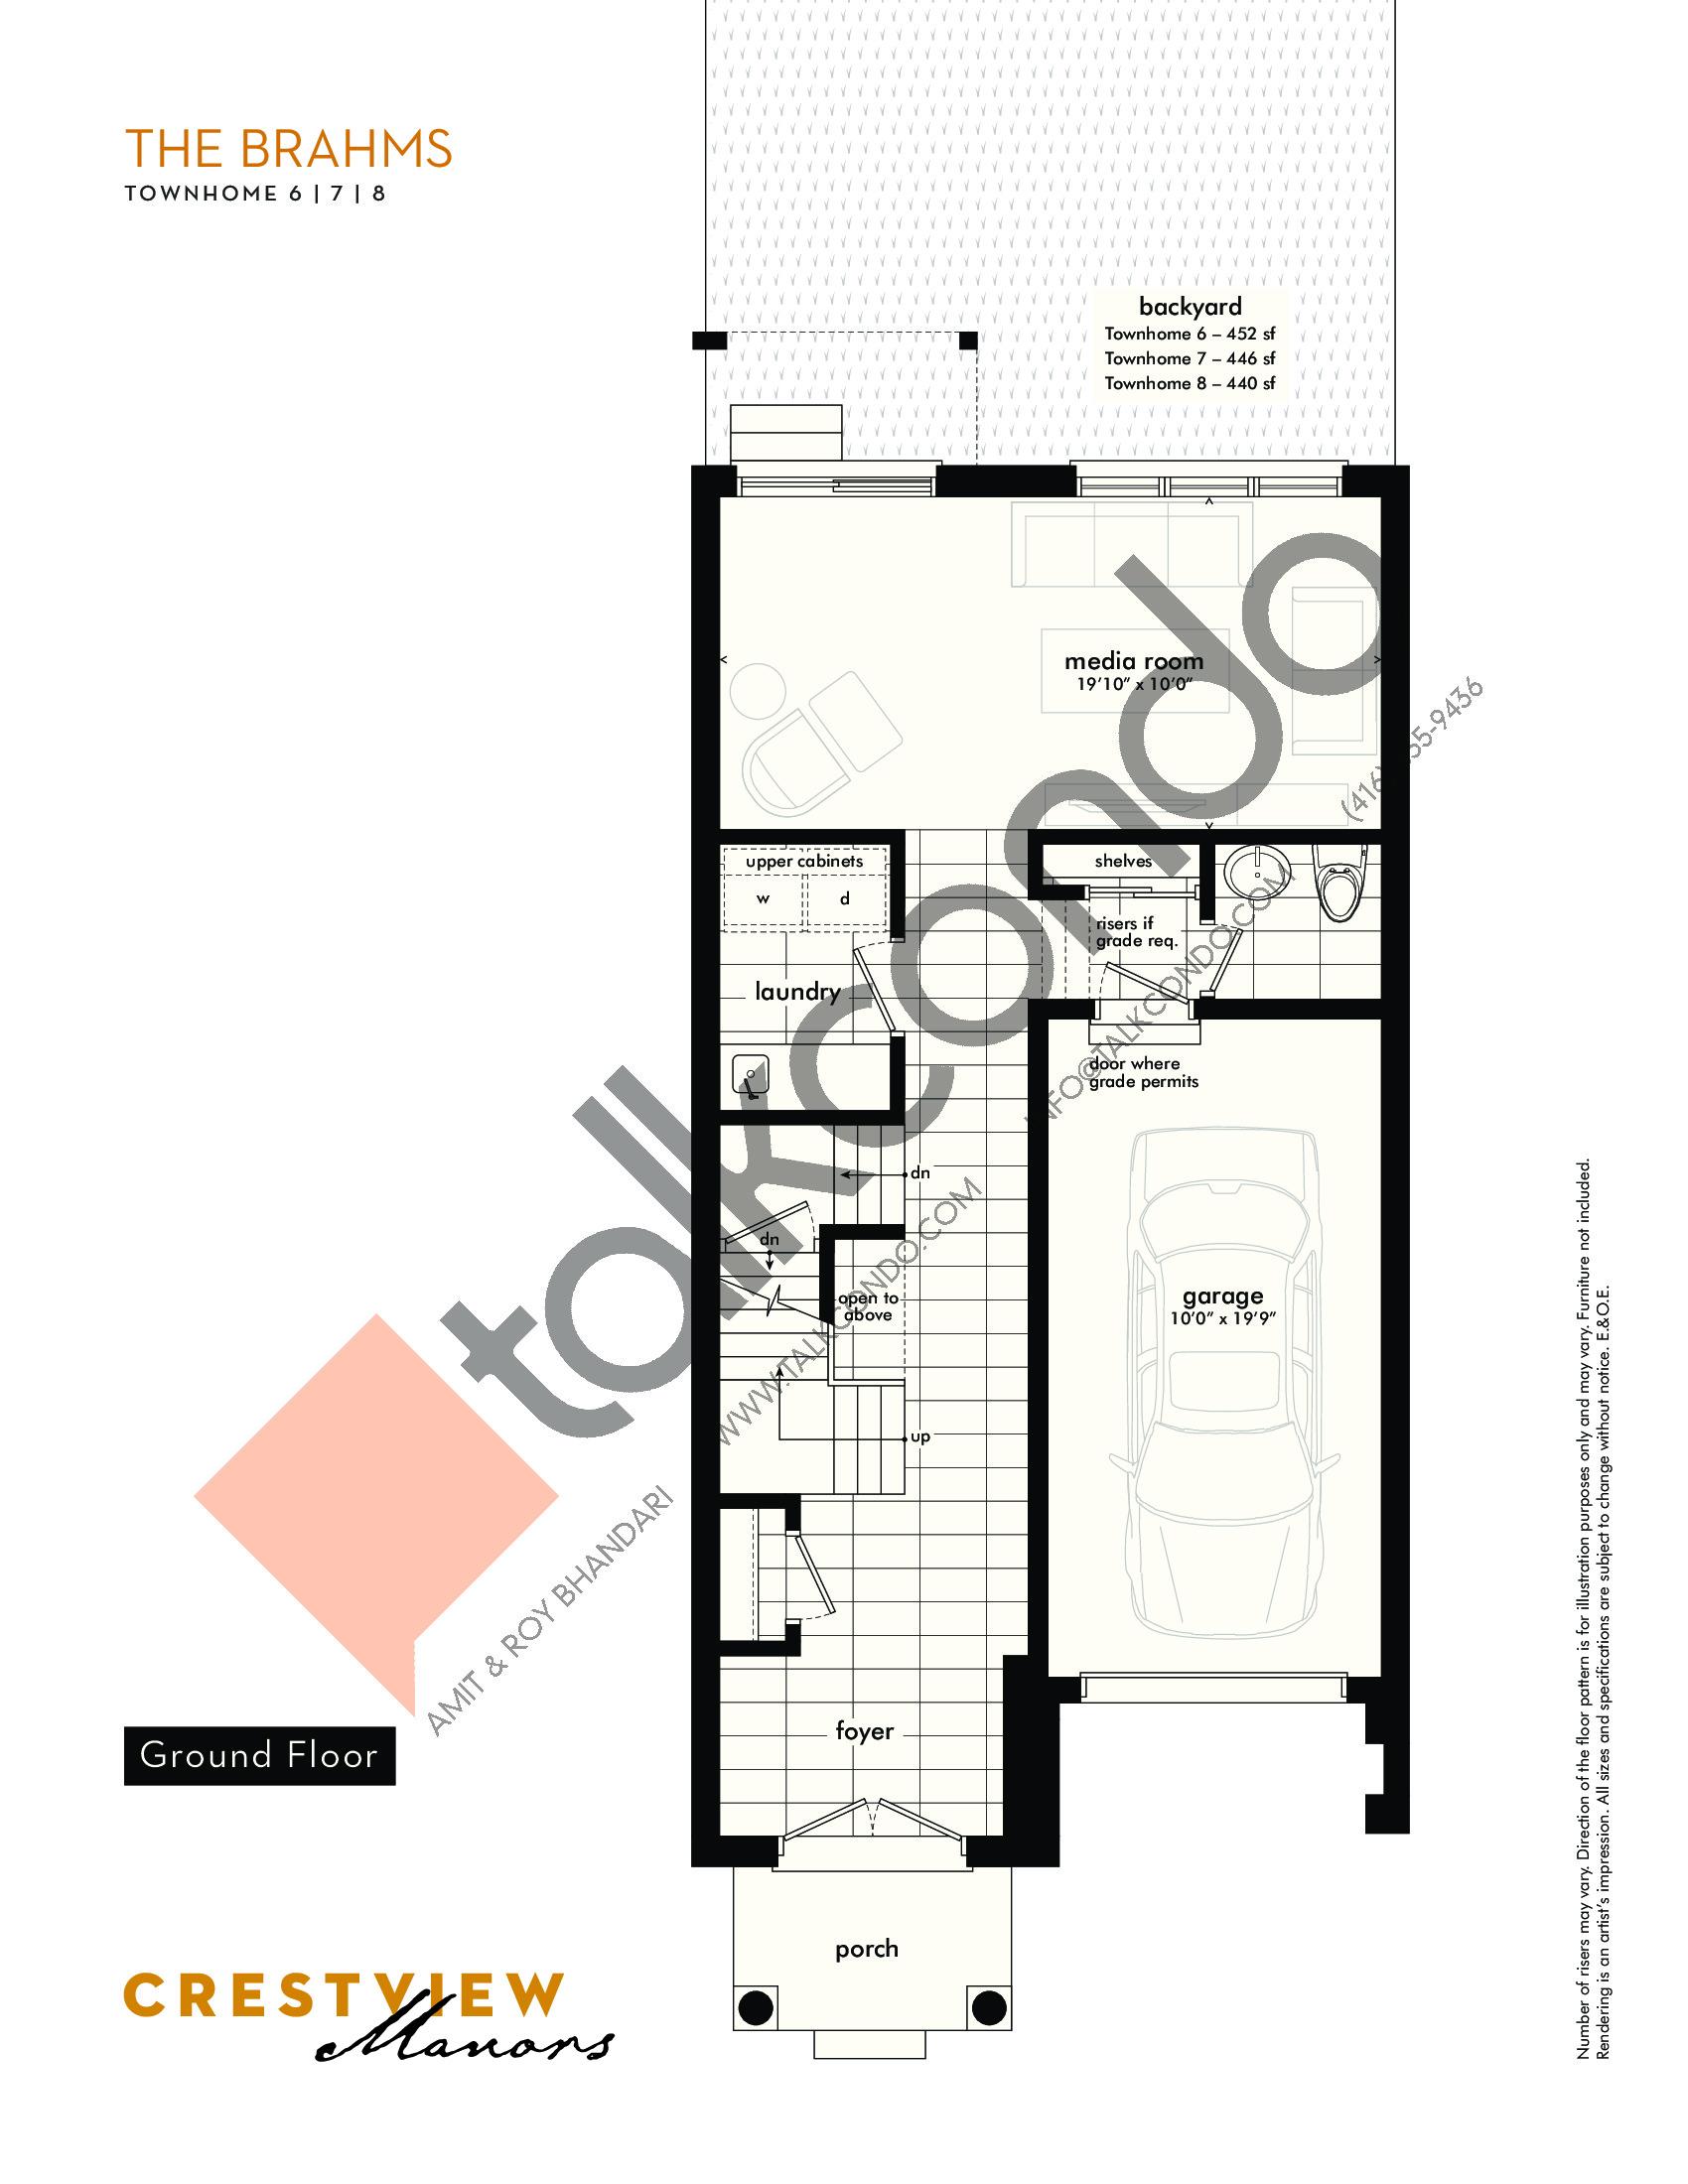 The Brahms - Ground Floor Floor Plan at Crestview Manors - 2282 sq.ft